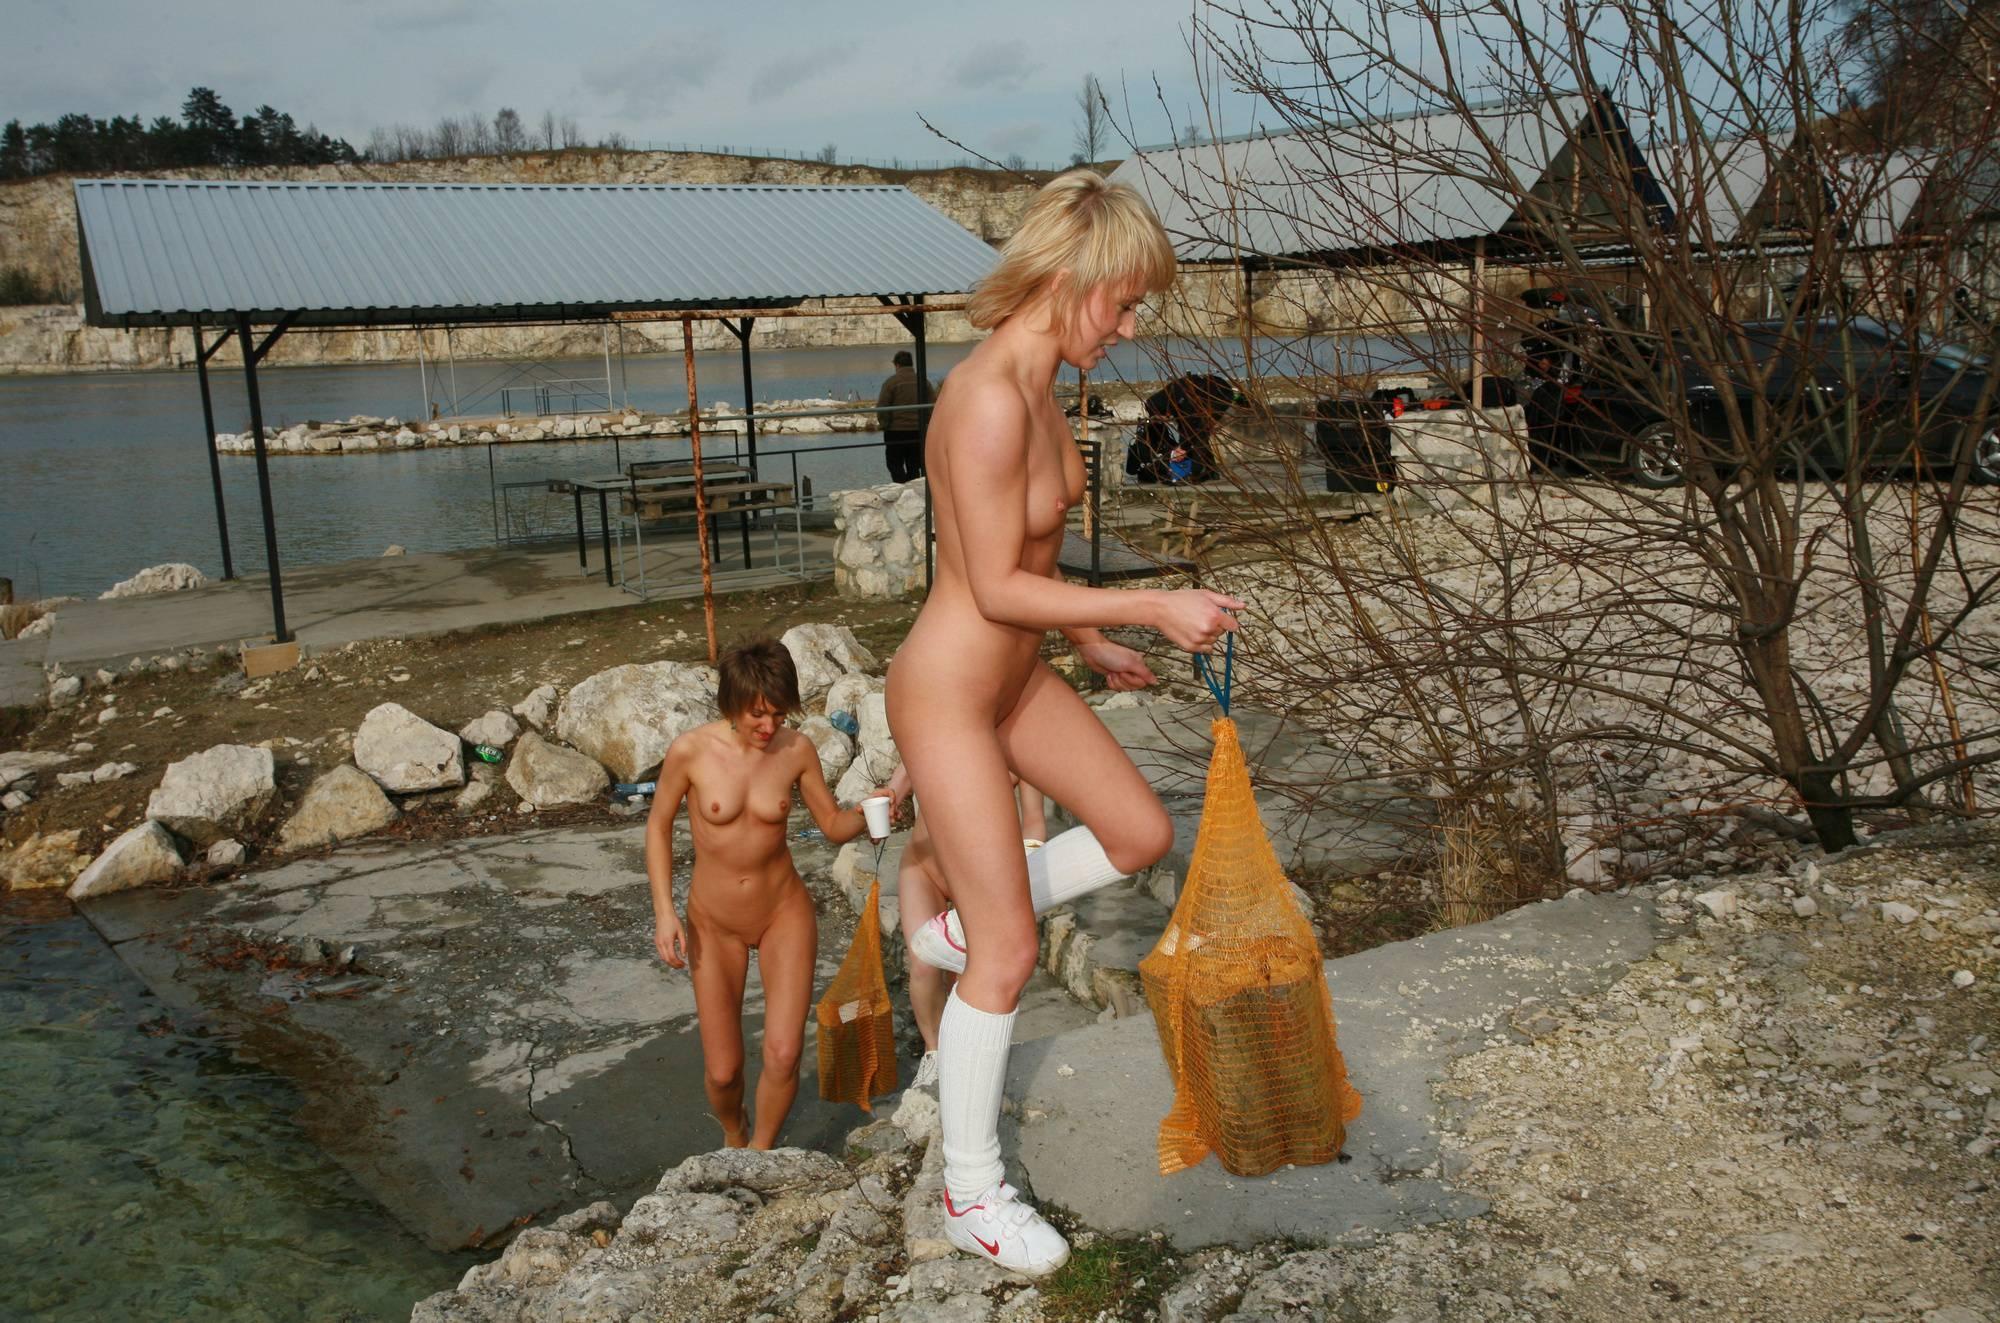 Nudist Pictures Camper Trip Log Carrying - 1